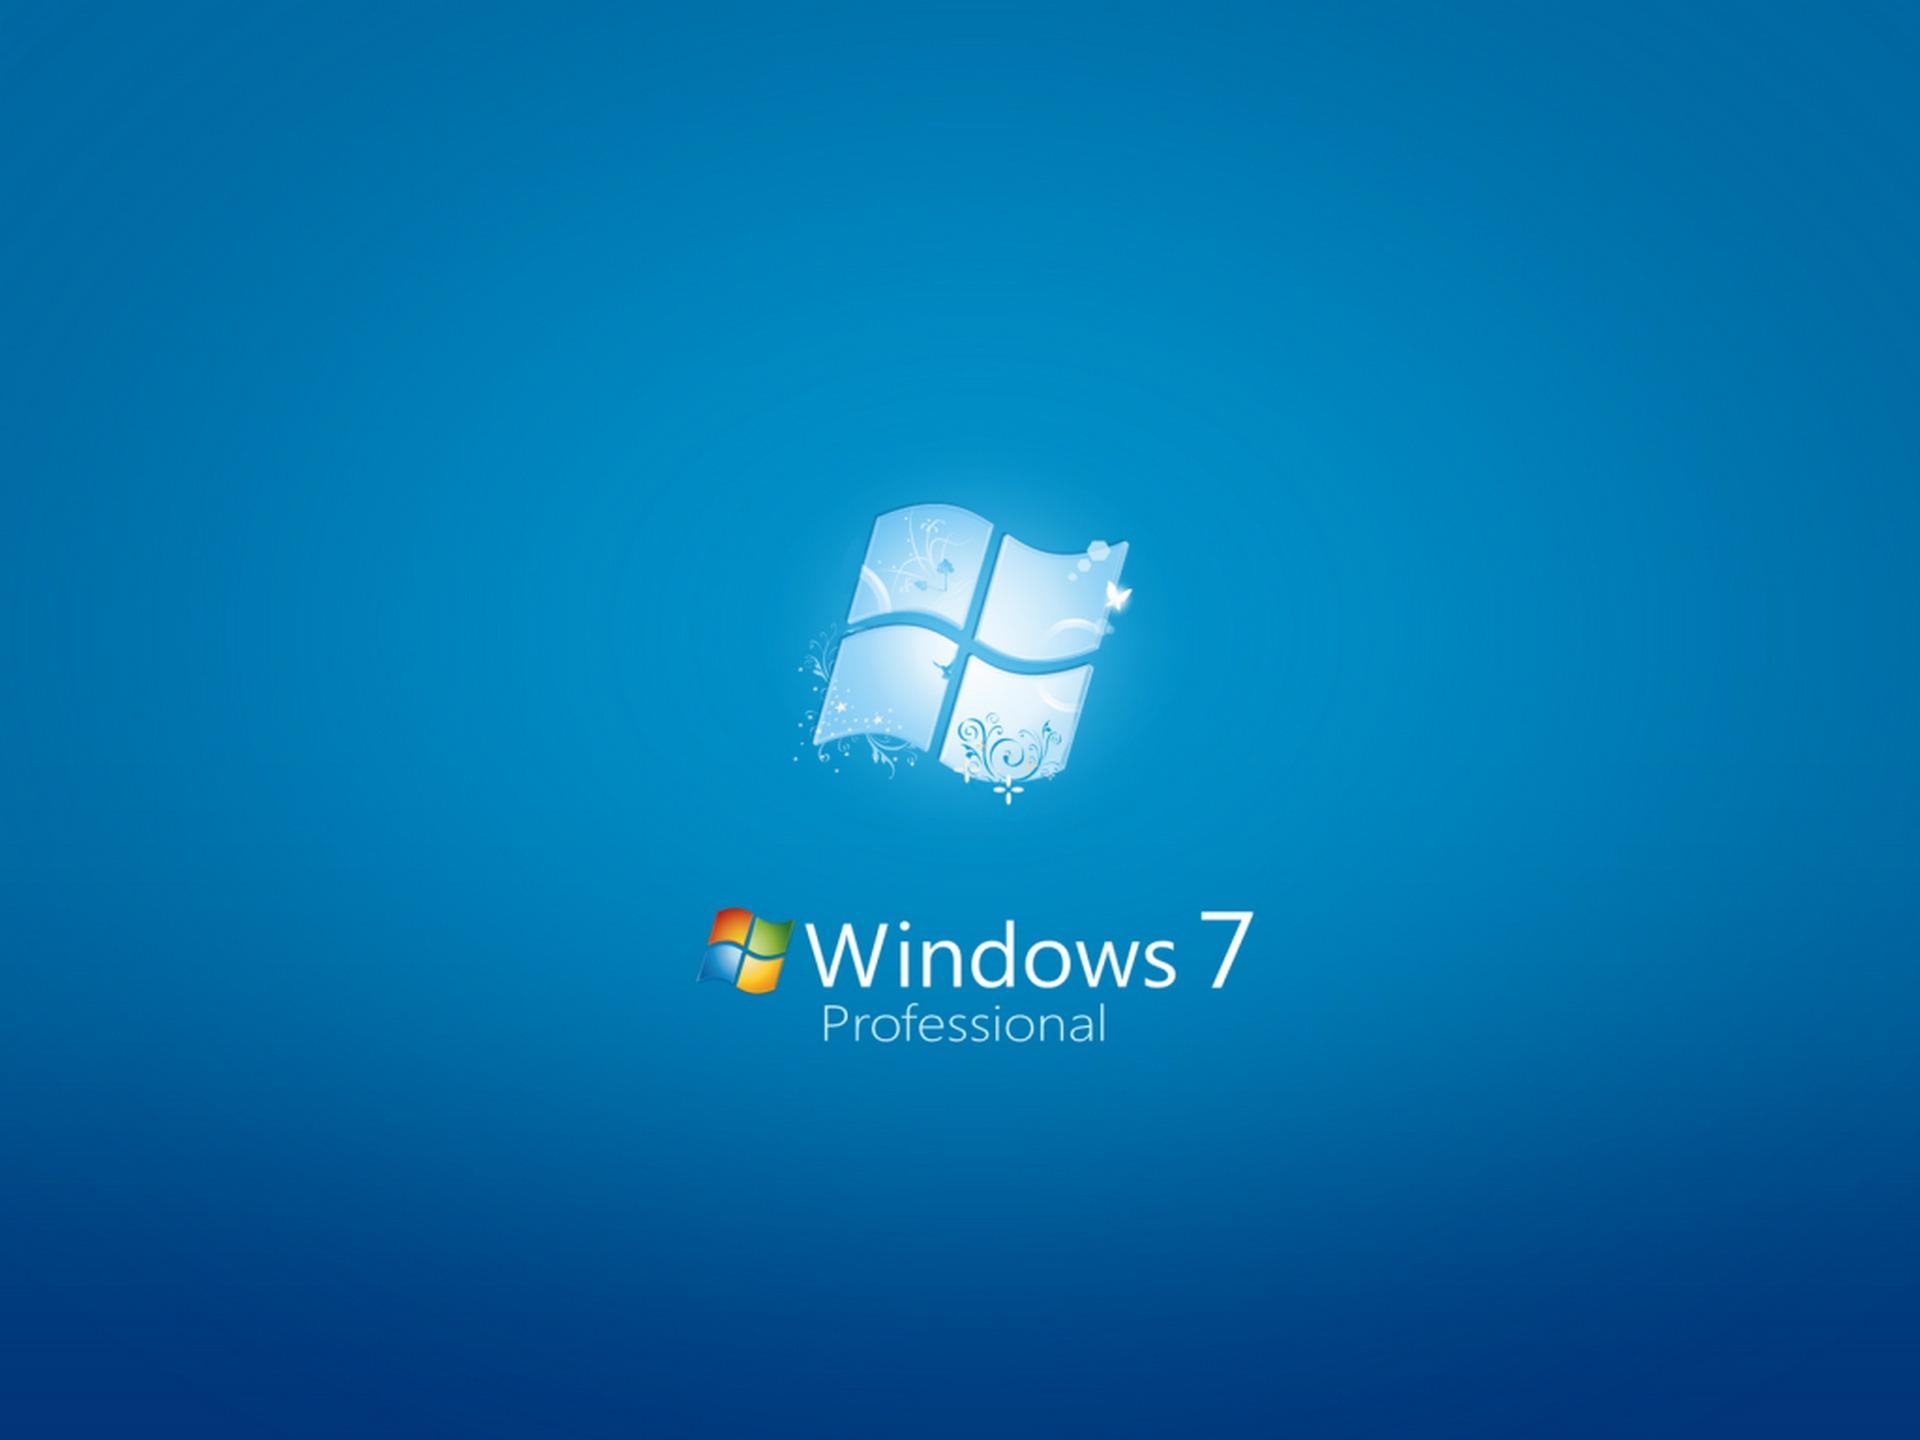 Windows 7 professional wallpaper windows seven computers for Window 7 professional